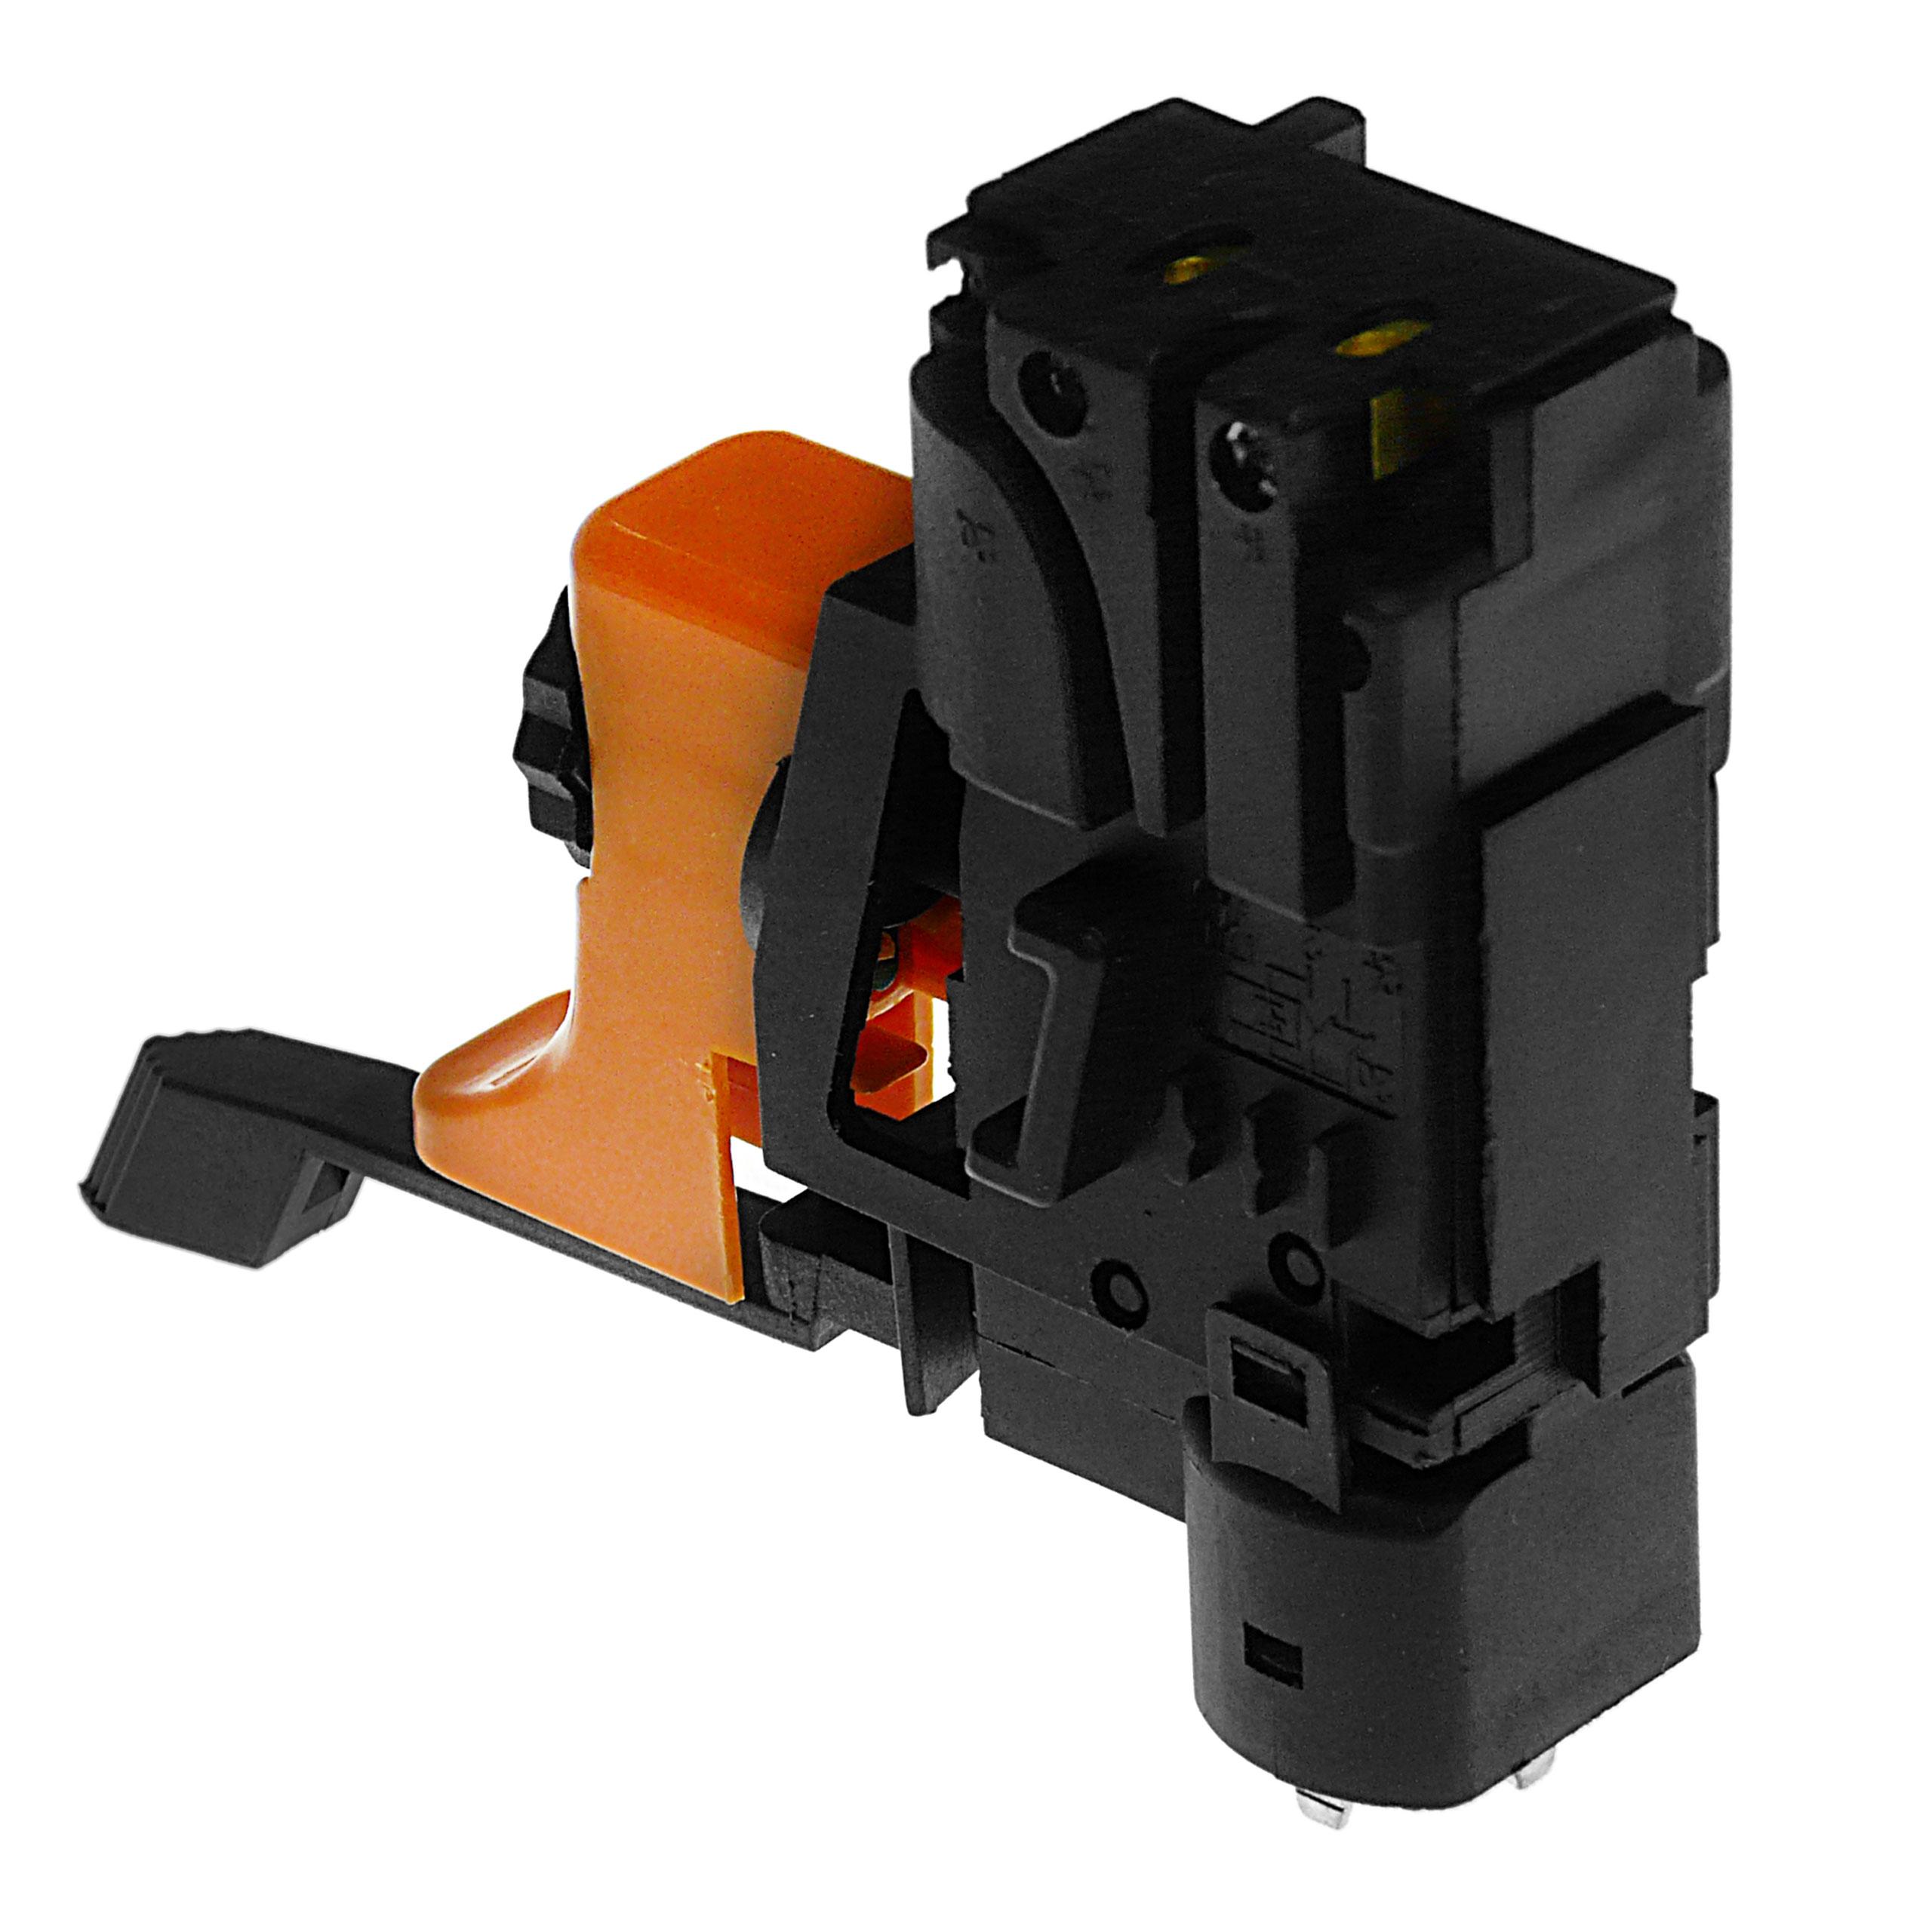 Schalter Bosch GSB 550 PBH 200 PBH 180  1607200172